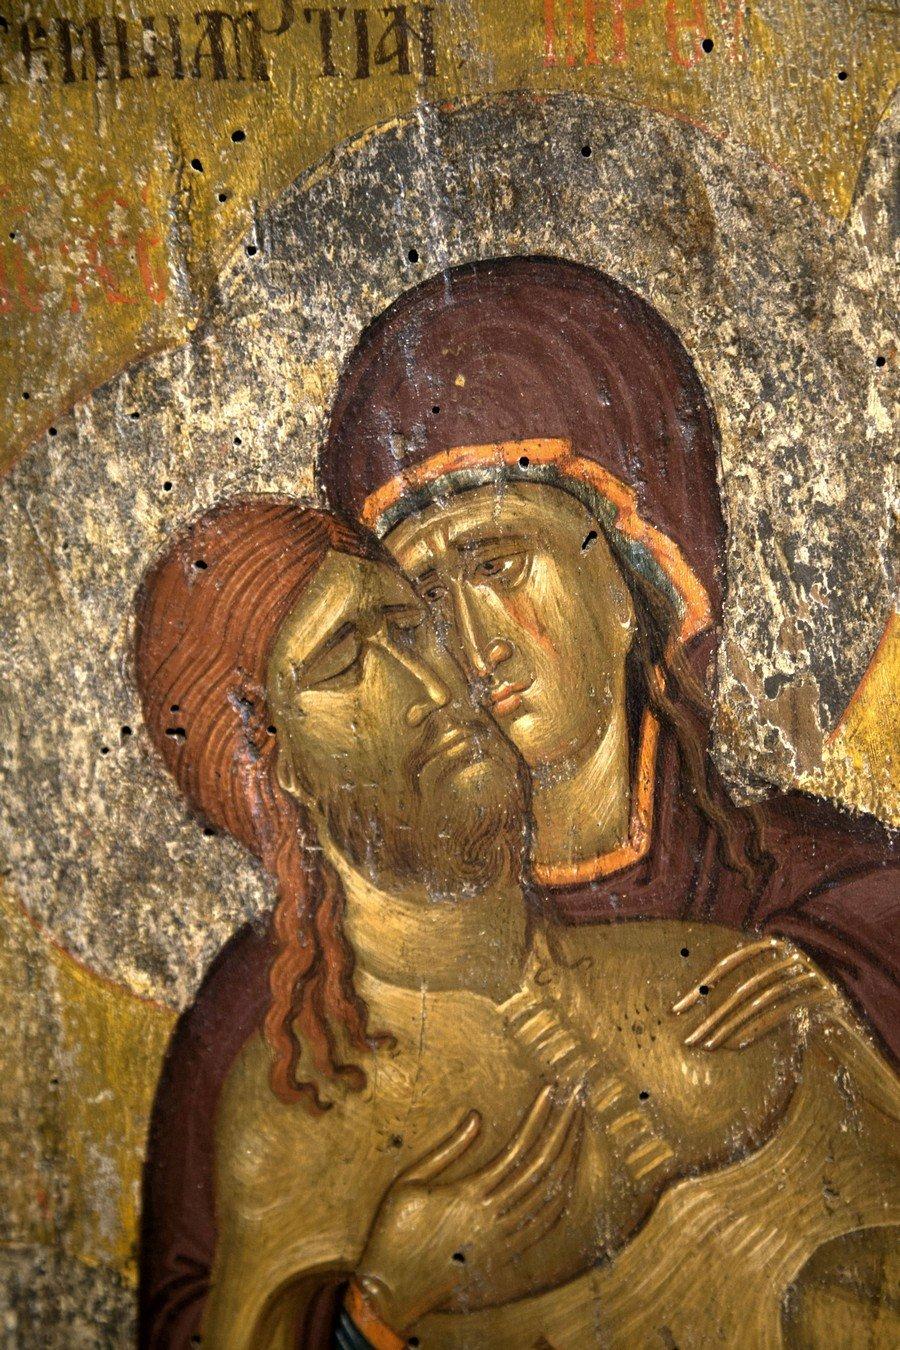 Снятие со Креста. Византийская икона начала XV века. Византийский музей в Кастории, Греция. Фрагмент.